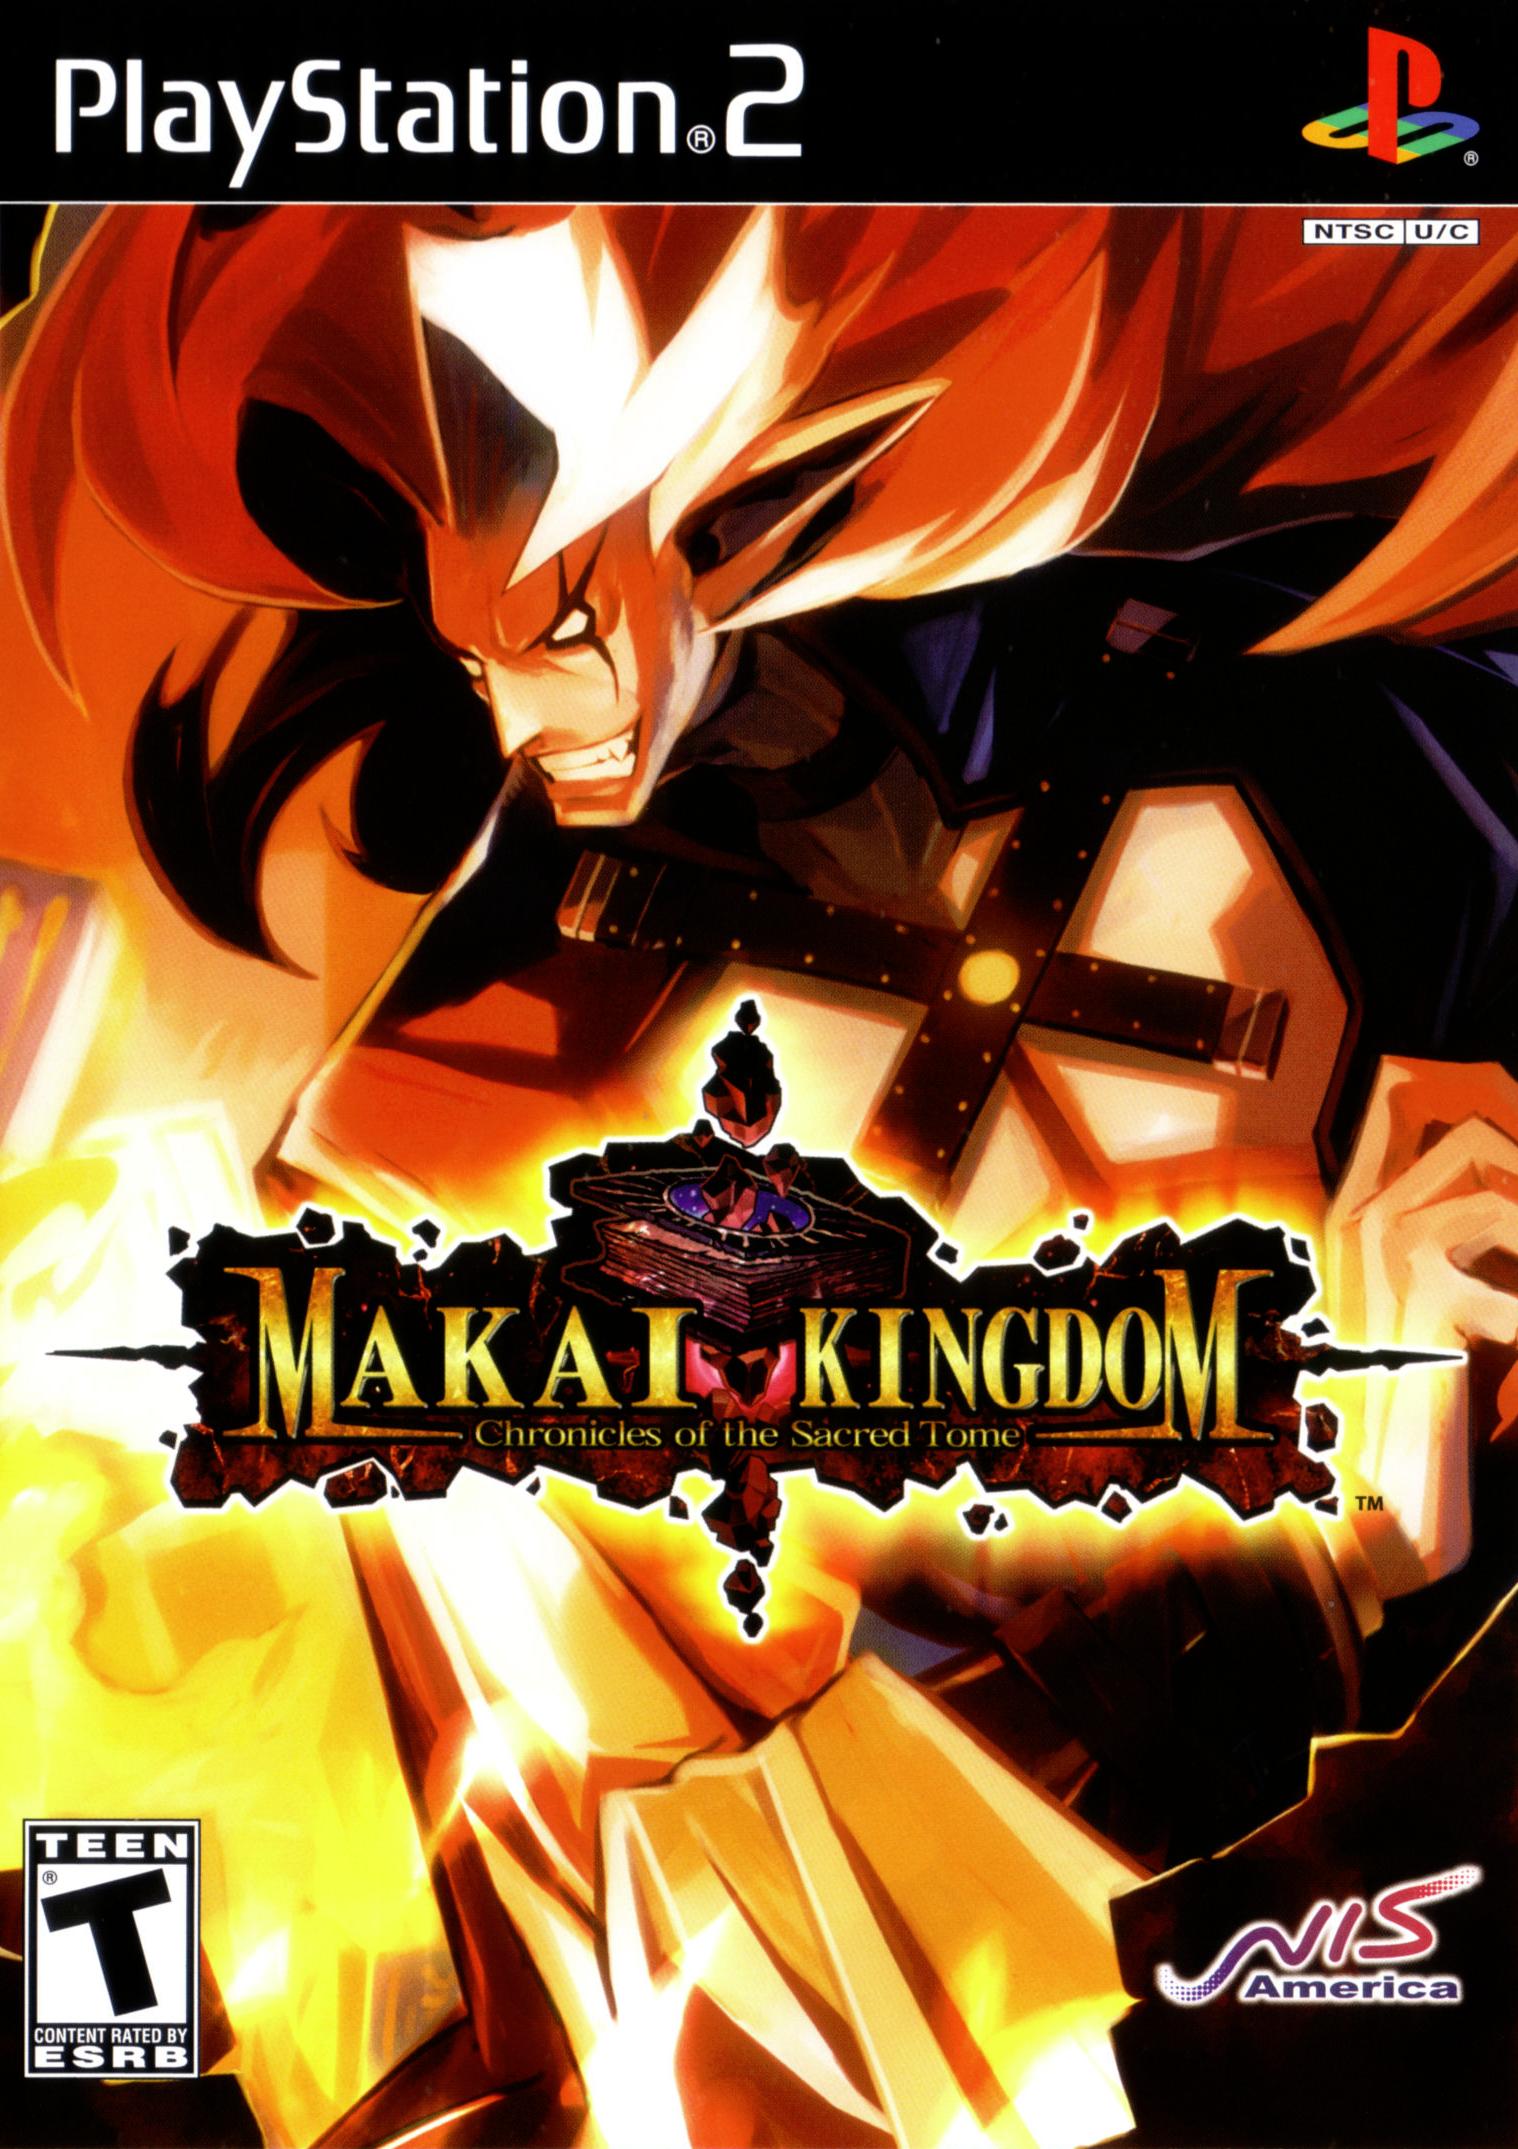 Makai Kingdom